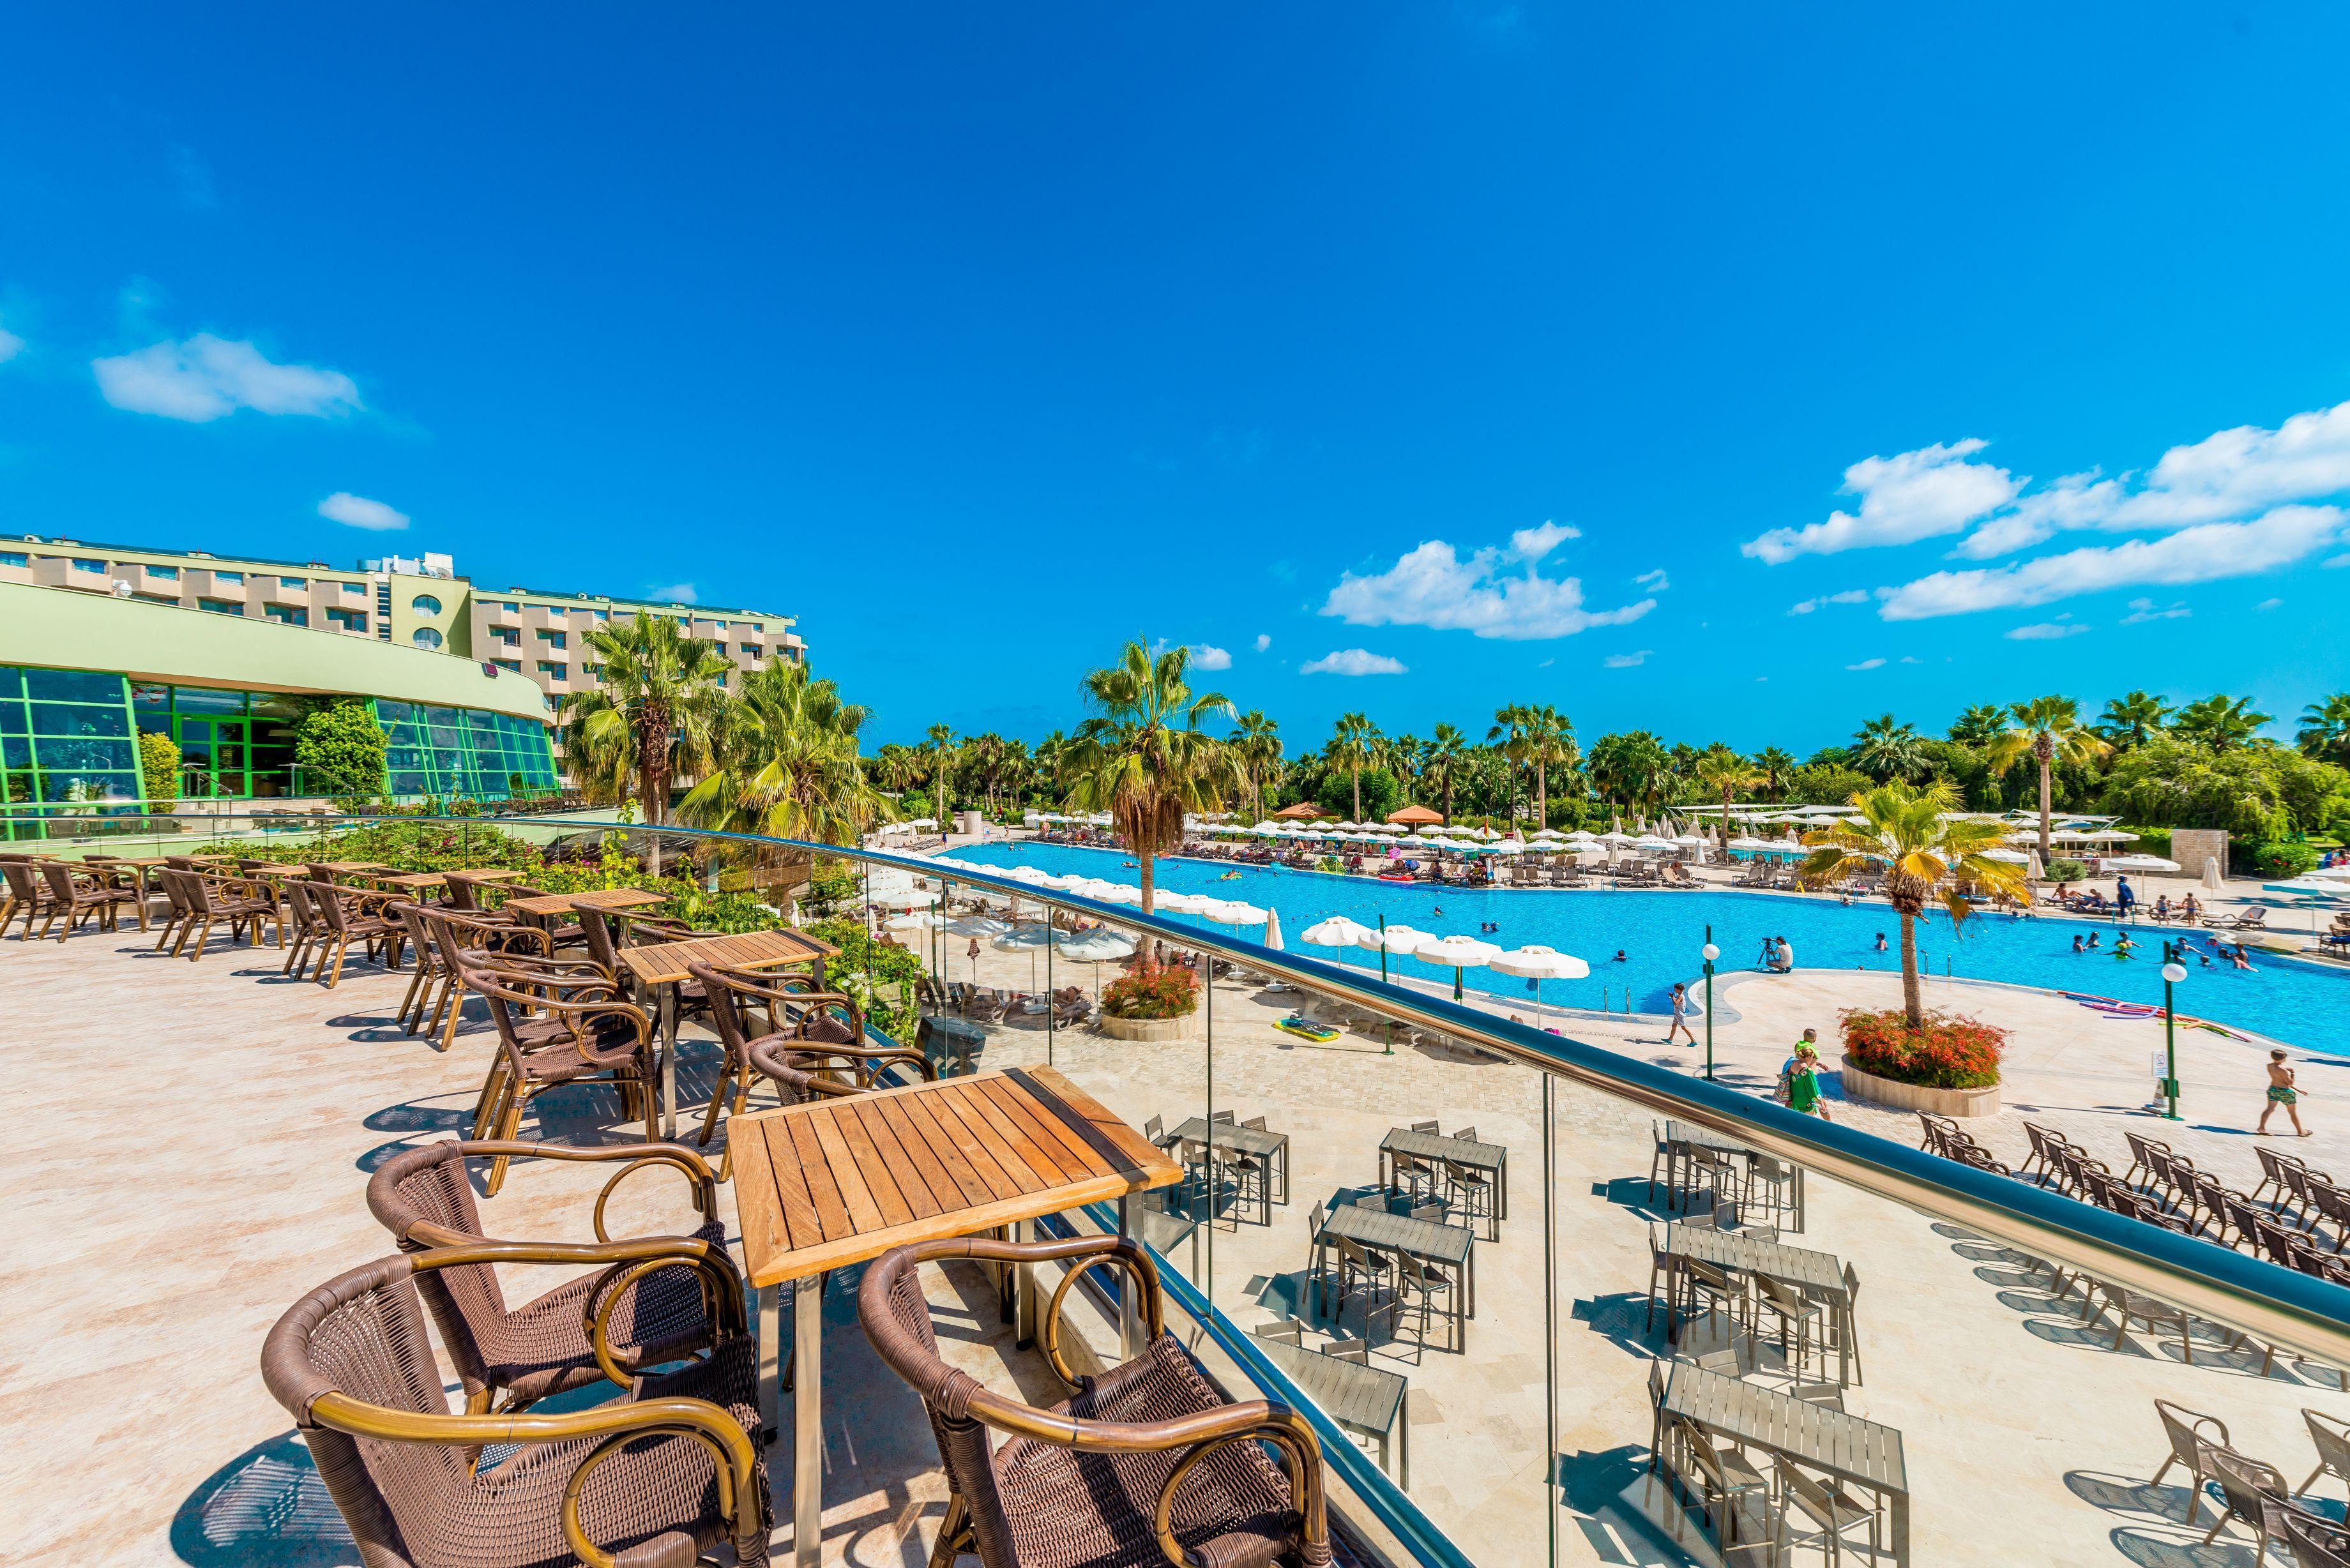 http://www.orextravel.sk/OREX/hotelphotos/vonresort-golden-coast-general-004.jpg